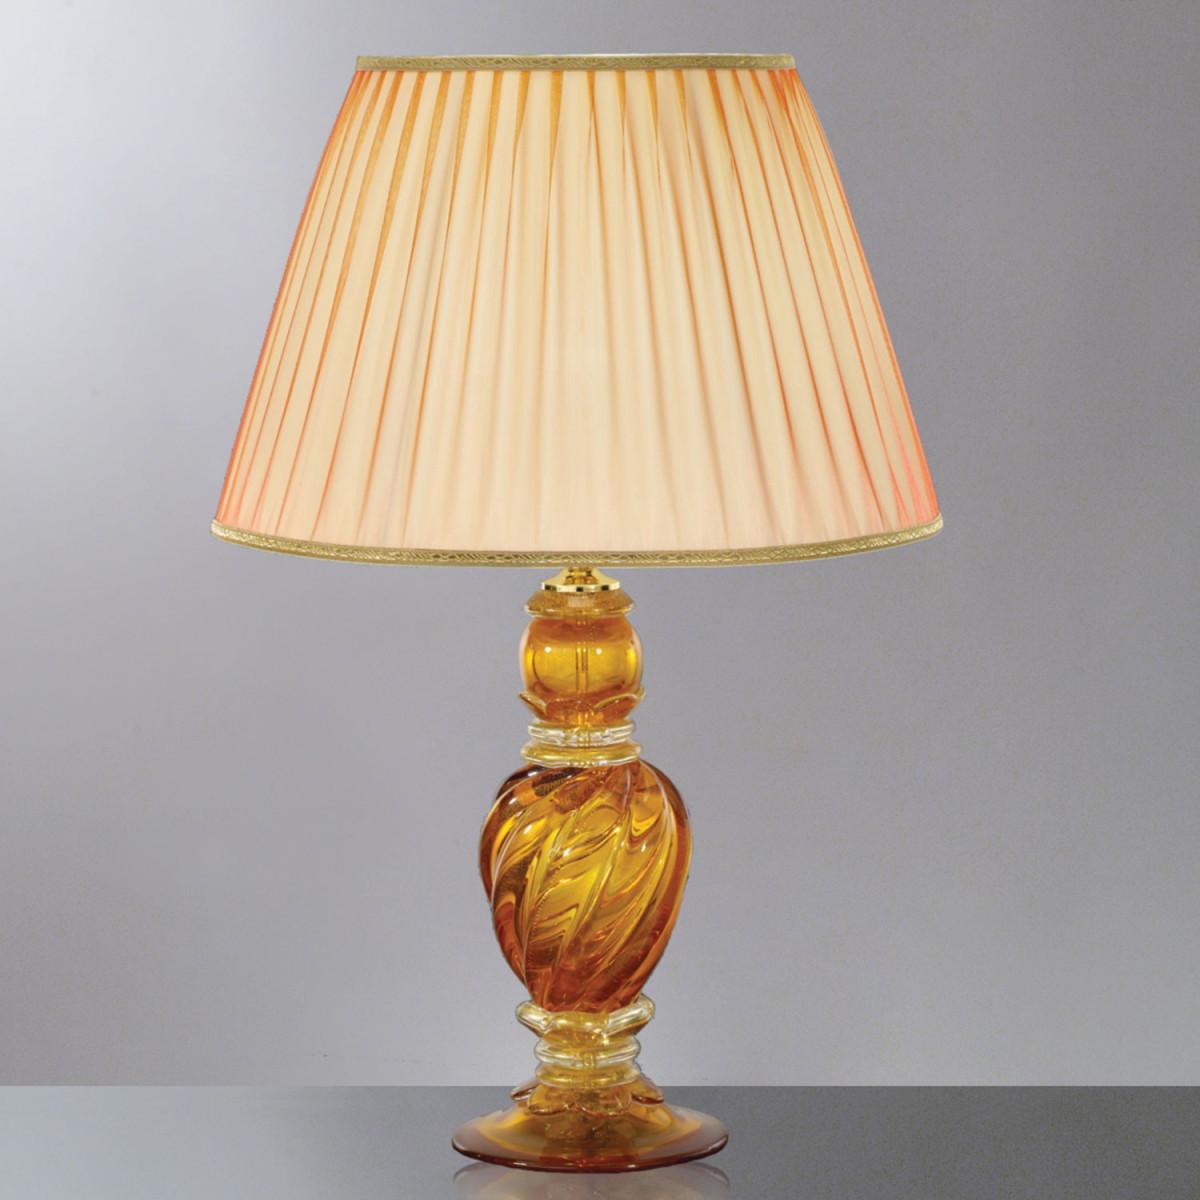 """Selene"" lampe de table de Murano ambre"